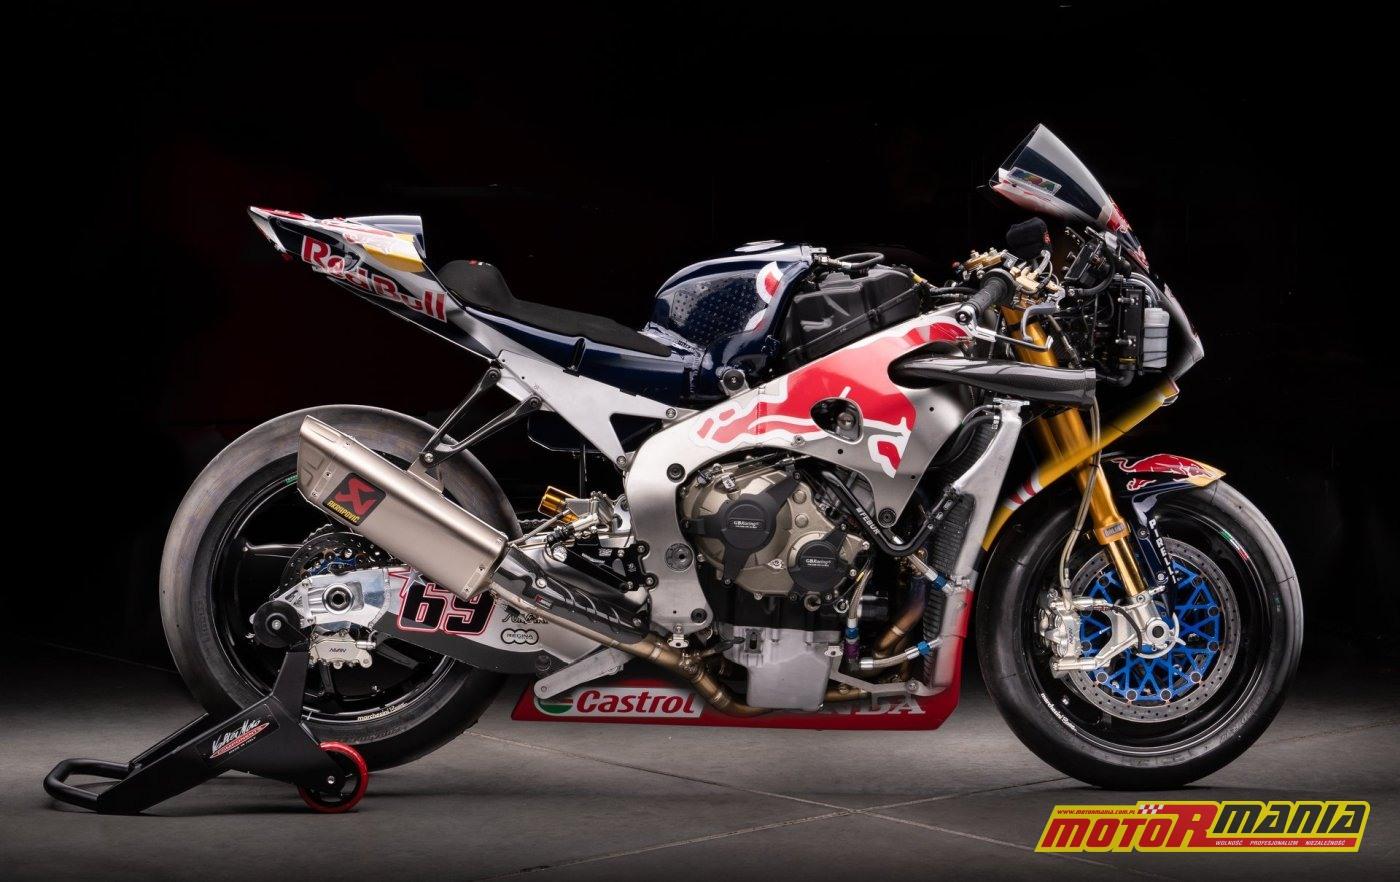 CBR1000RR SP2 World SBK Nicky Hayden na sprzedaz (5)